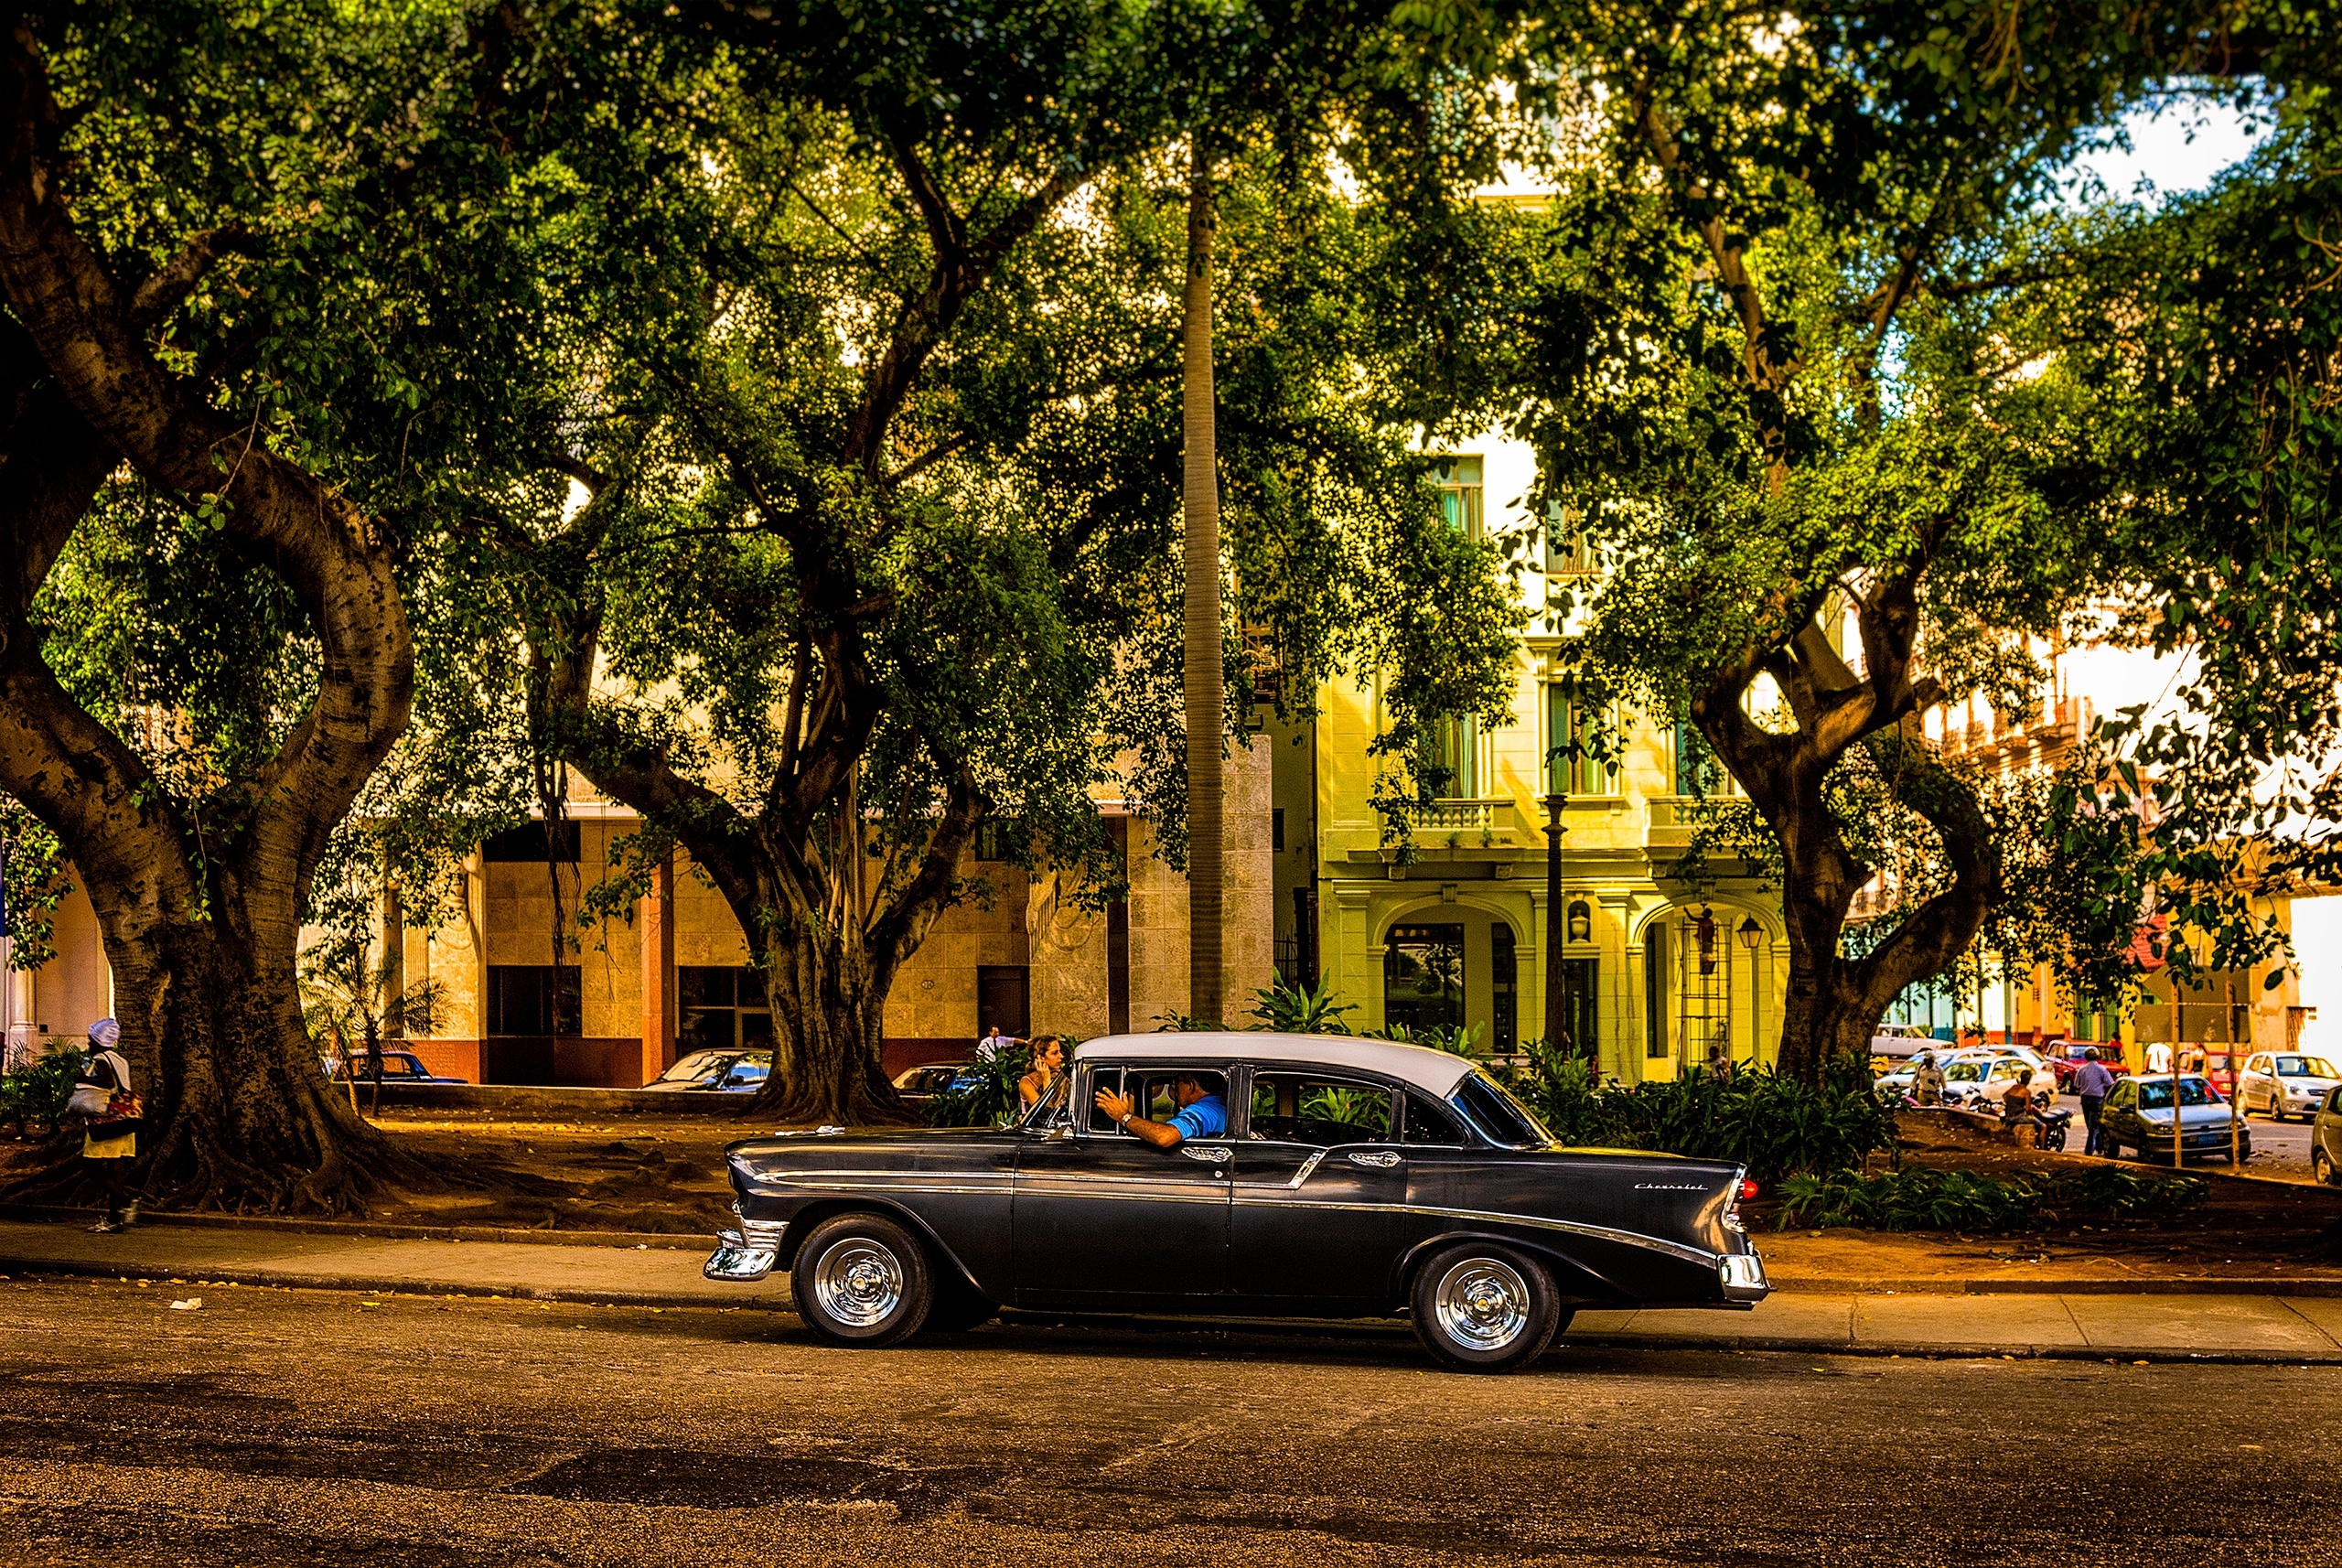 tropical cruising - Habana, Cuba - christofkessemeier   ello